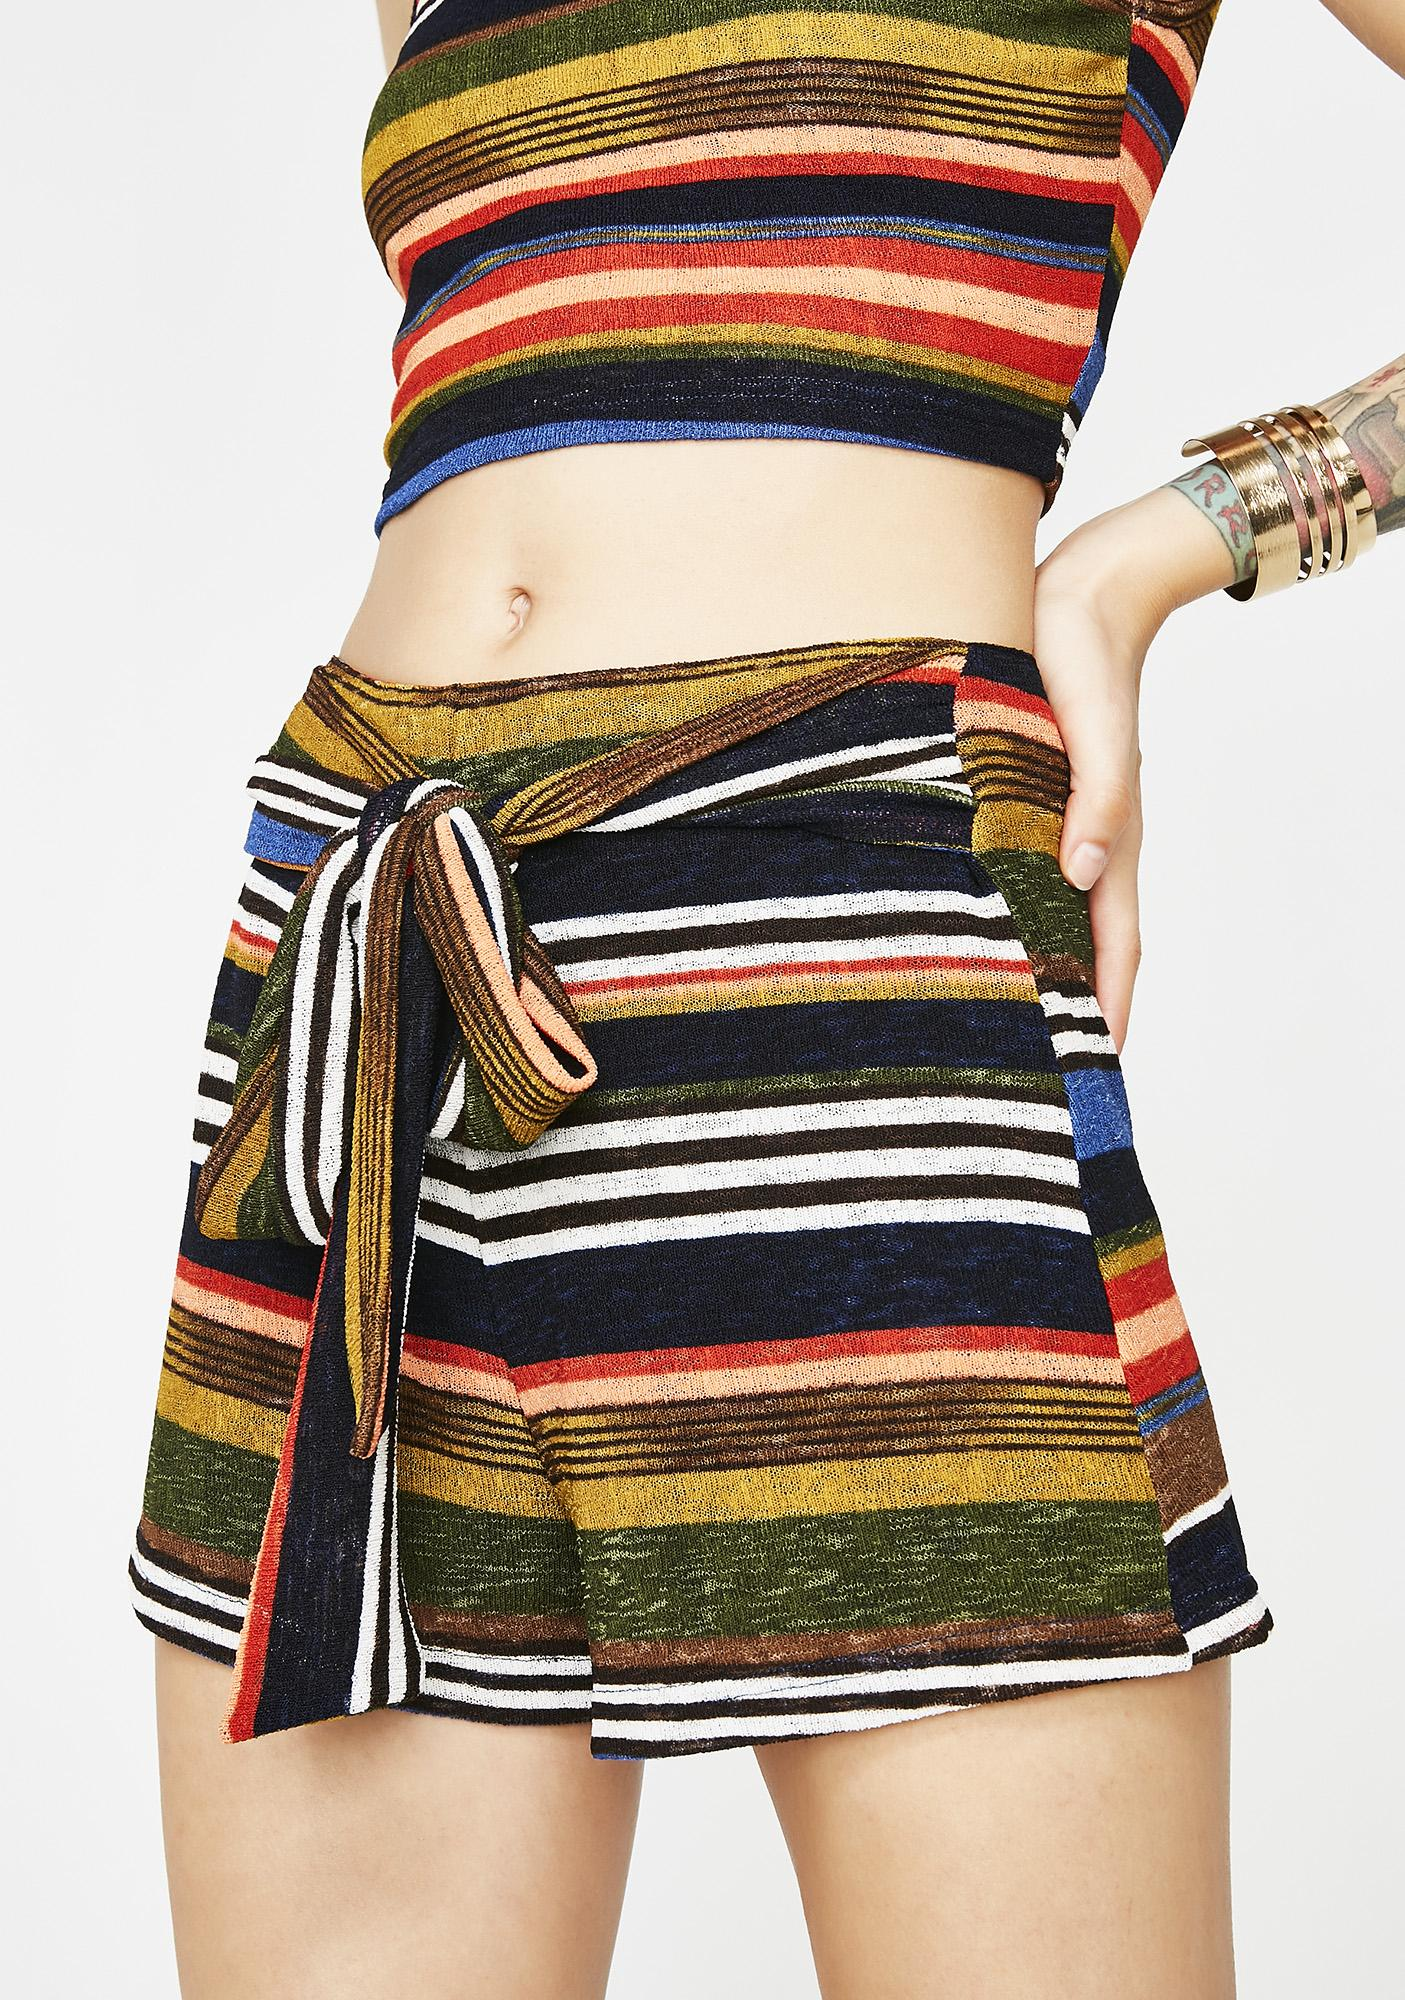 Deja Vu Striped Shorts